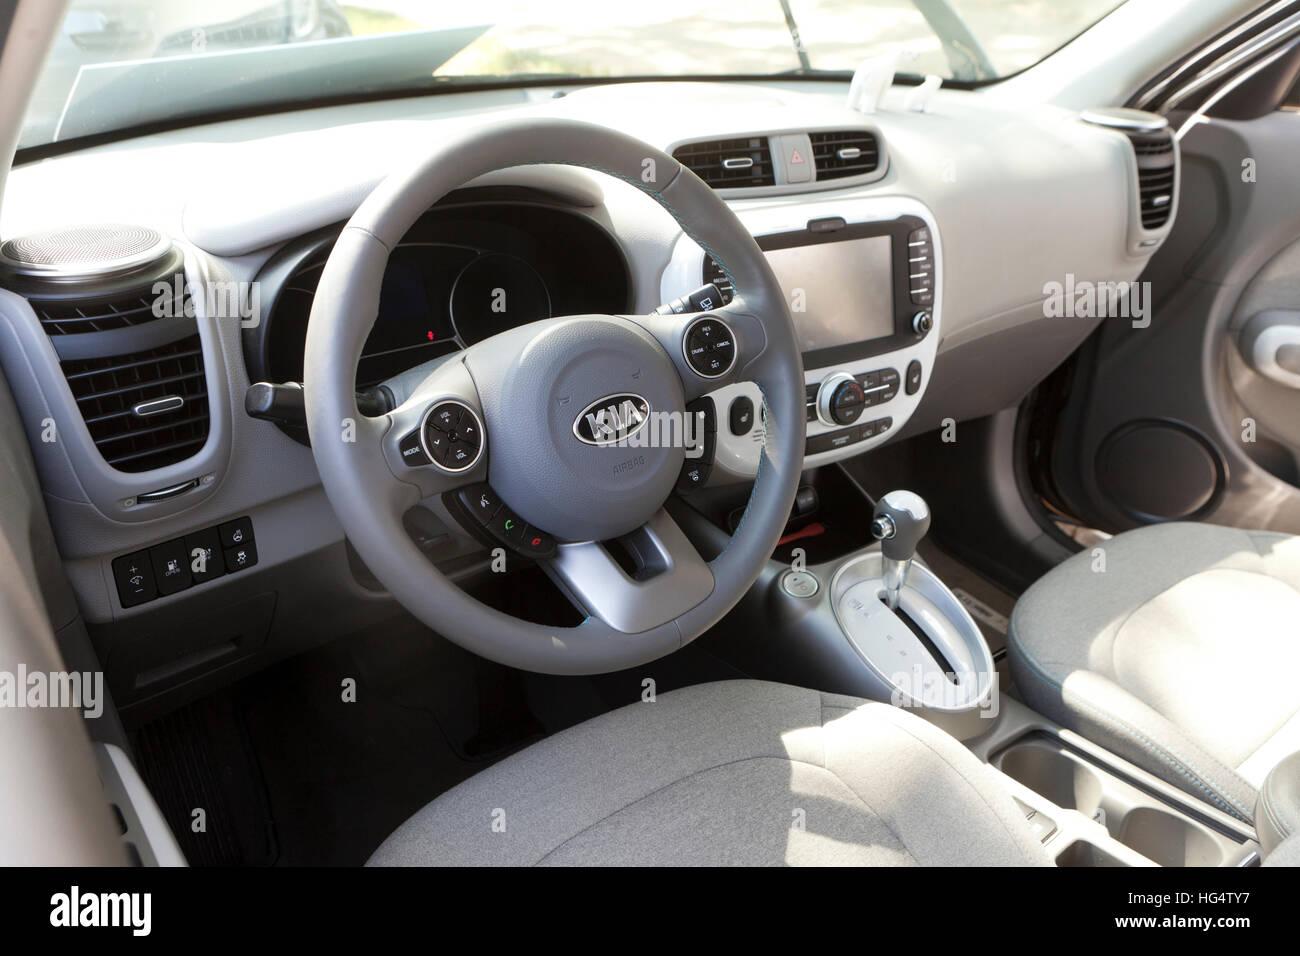 2016 Kia Soul electric vehicle interior - USA - Stock Image